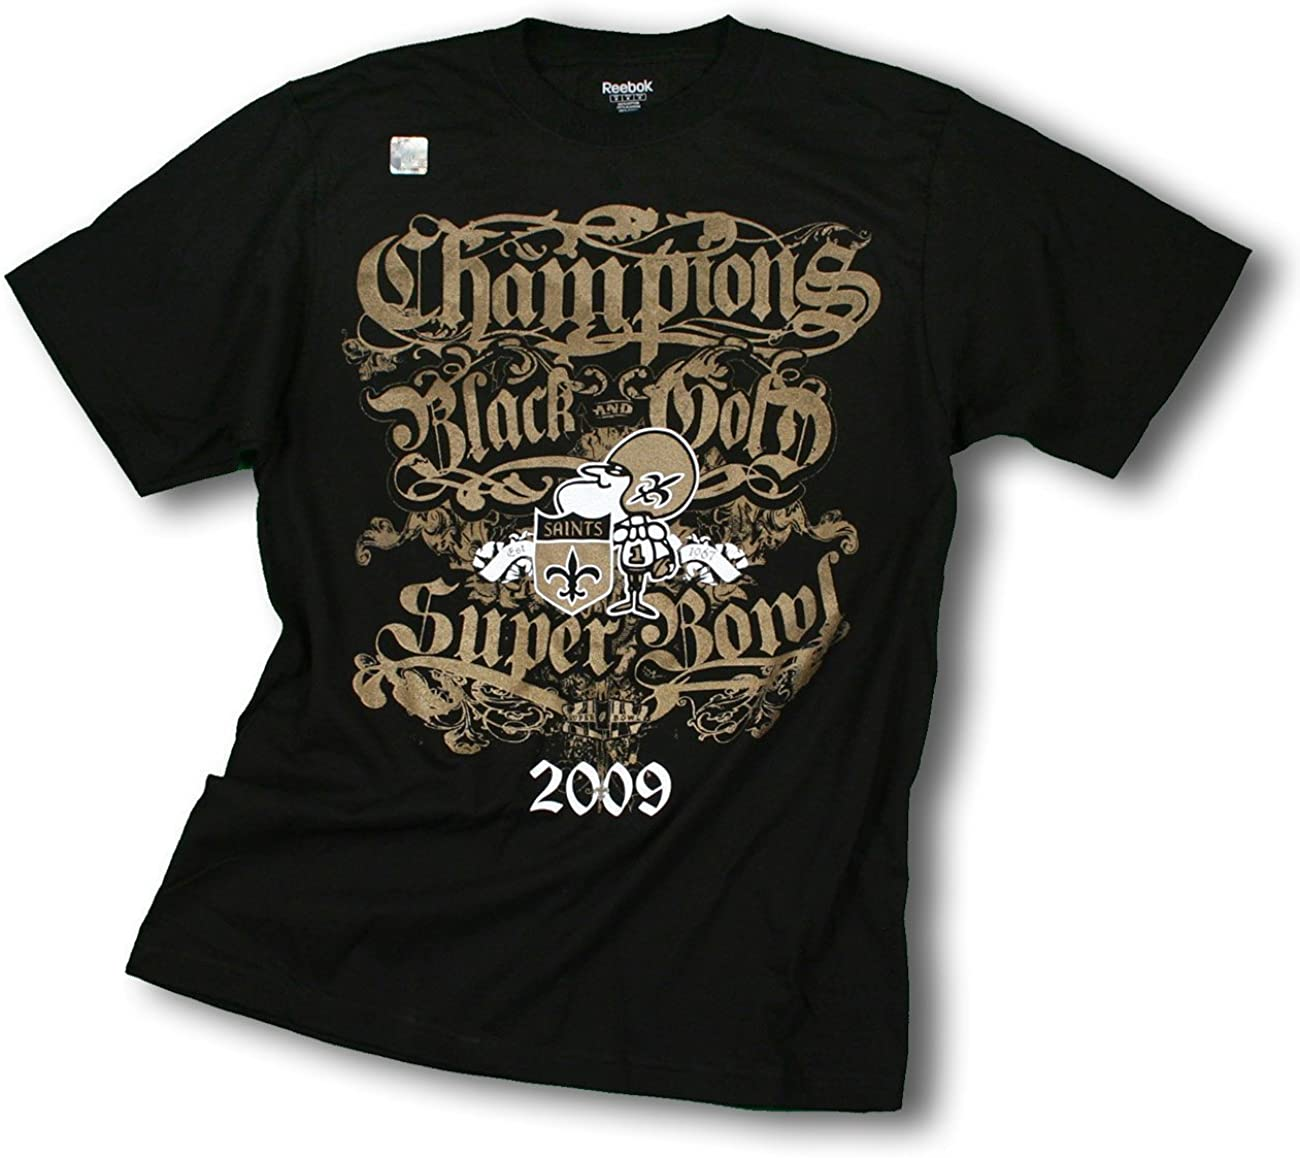 SB 44 NFL Champions T-shirt